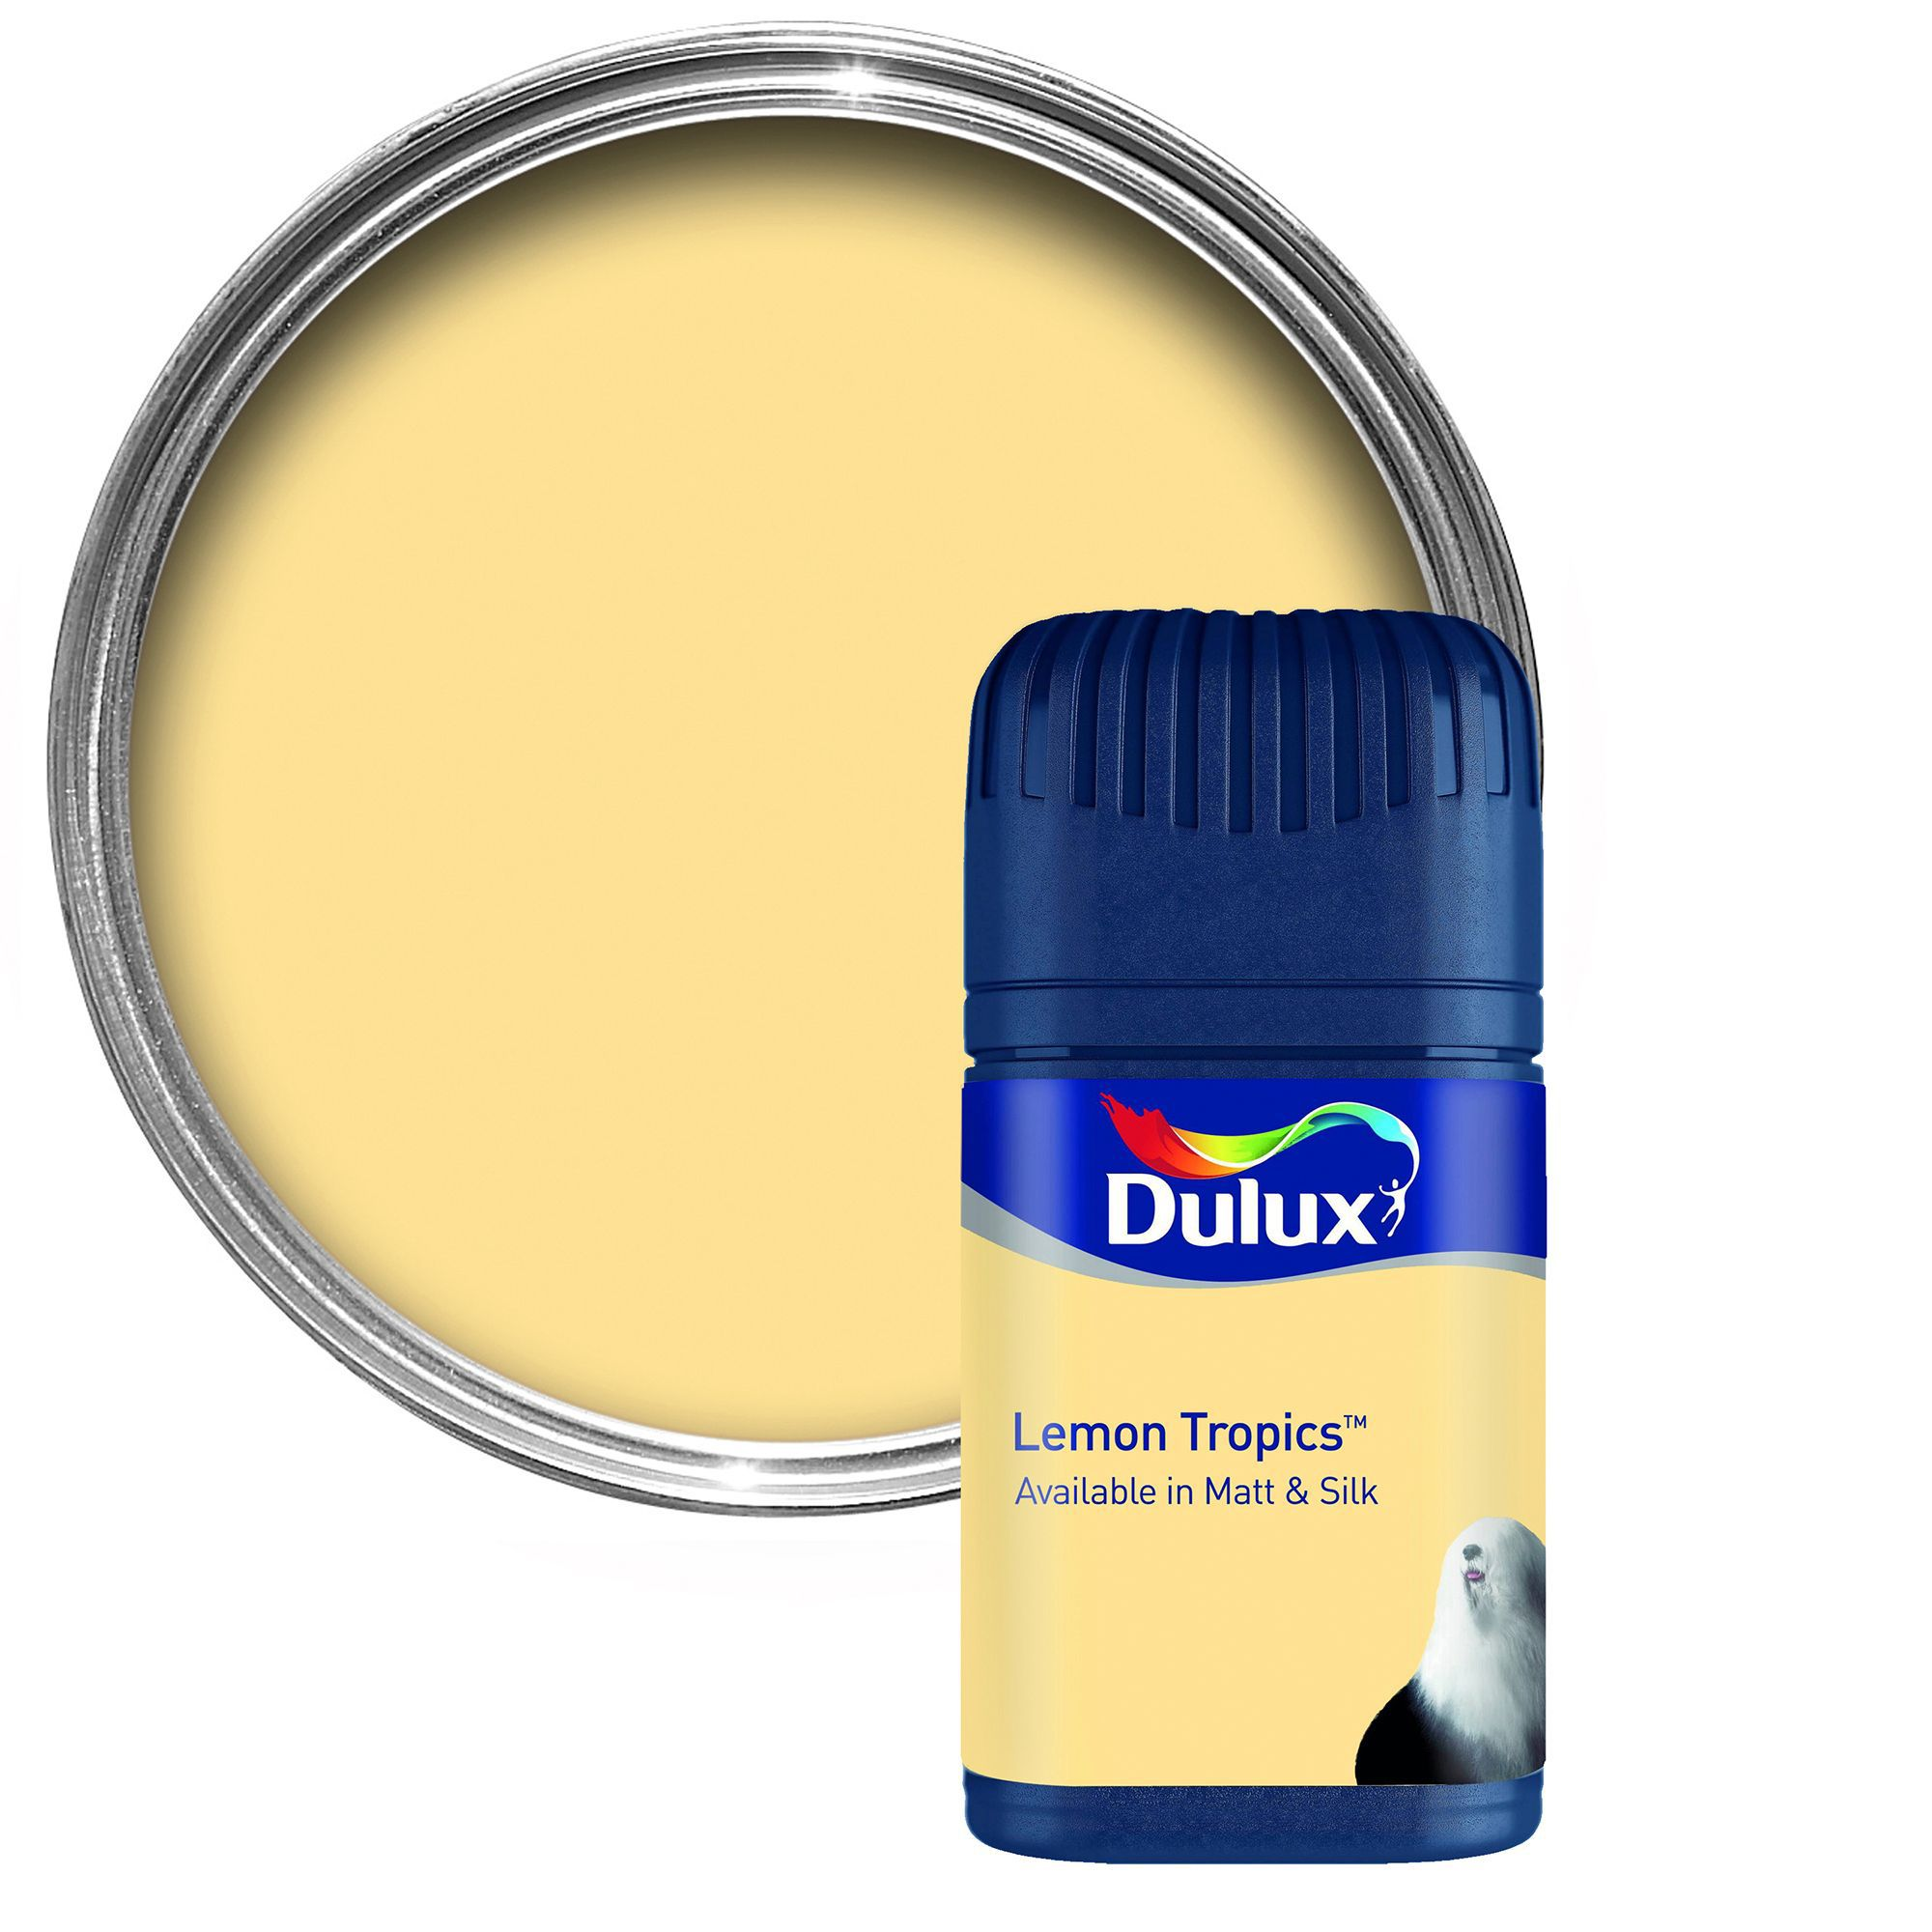 Dulux Lemon Tropics Matt Emulsion Paint 50ml Tester Pot